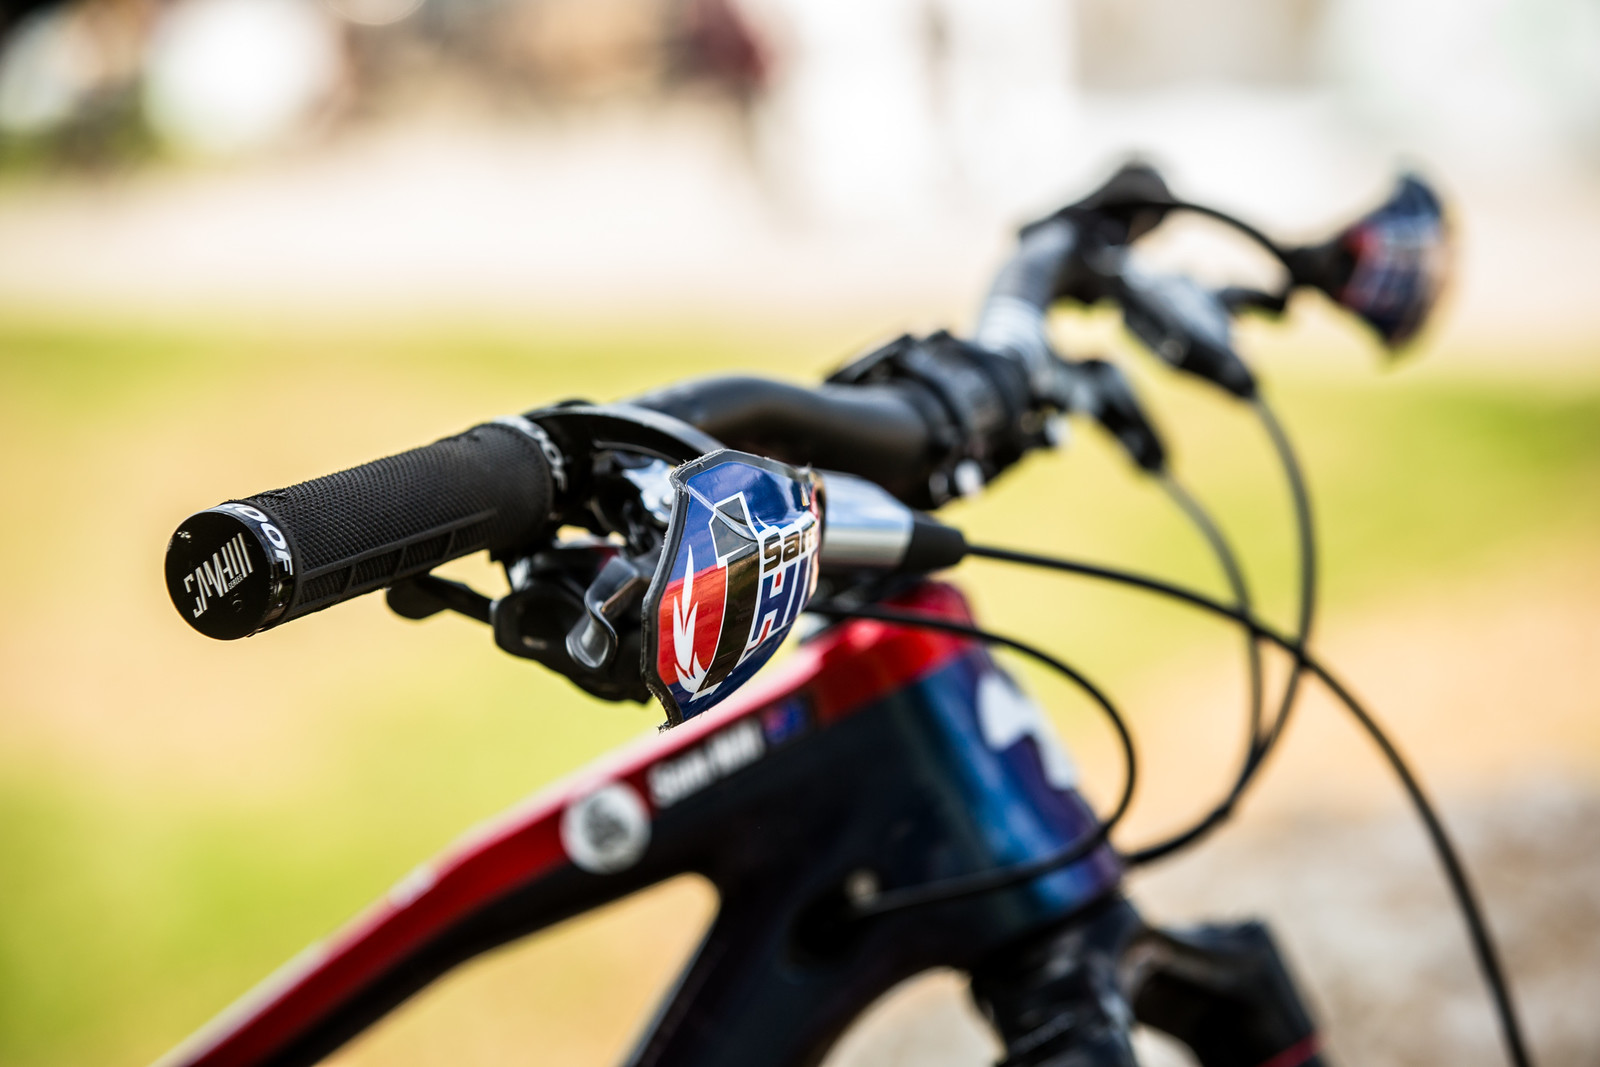 Extra Soft Semi-Throttle Compound Prototype Sam Hill Grips - WINNING BIKE - Sam Hill's Nukeproof Mega 275 - Mountain Biking Pictures - Vital MTB